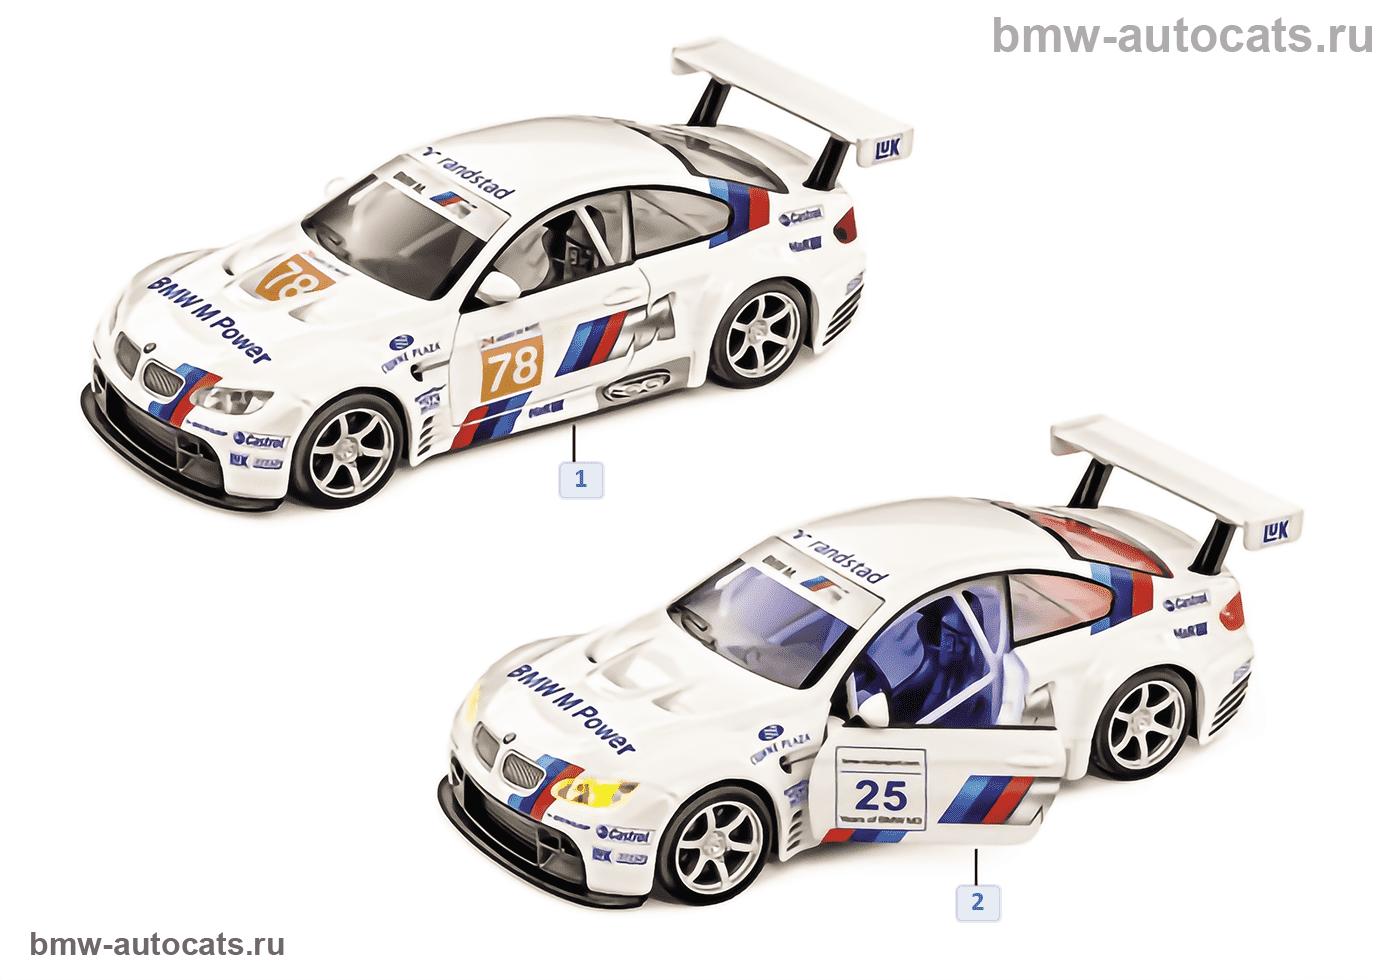 BMW Miniaturen — BMW 3er Reihe 2011/12